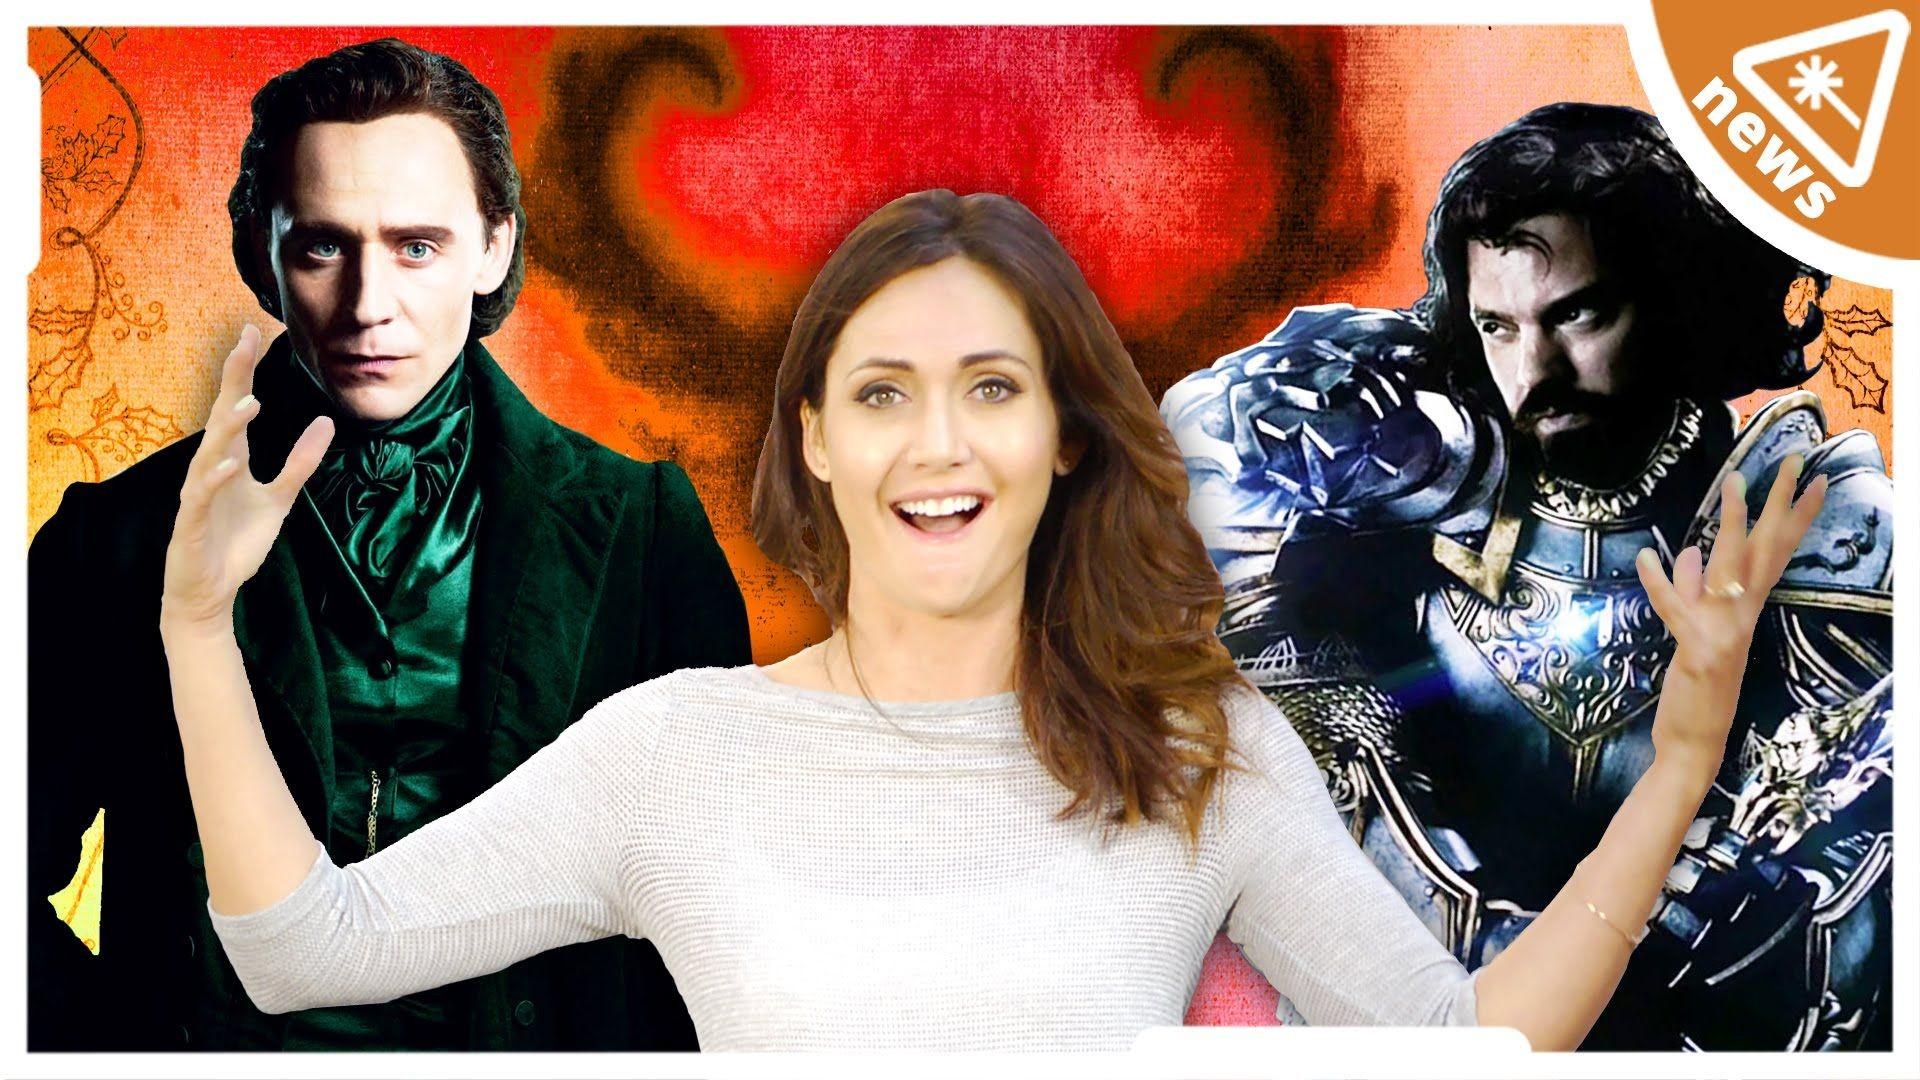 Res: 1920x1080, Crimson Peak and Warcraft Panels at Comic Con! (Nerdist News w/ Jessica  Chobot